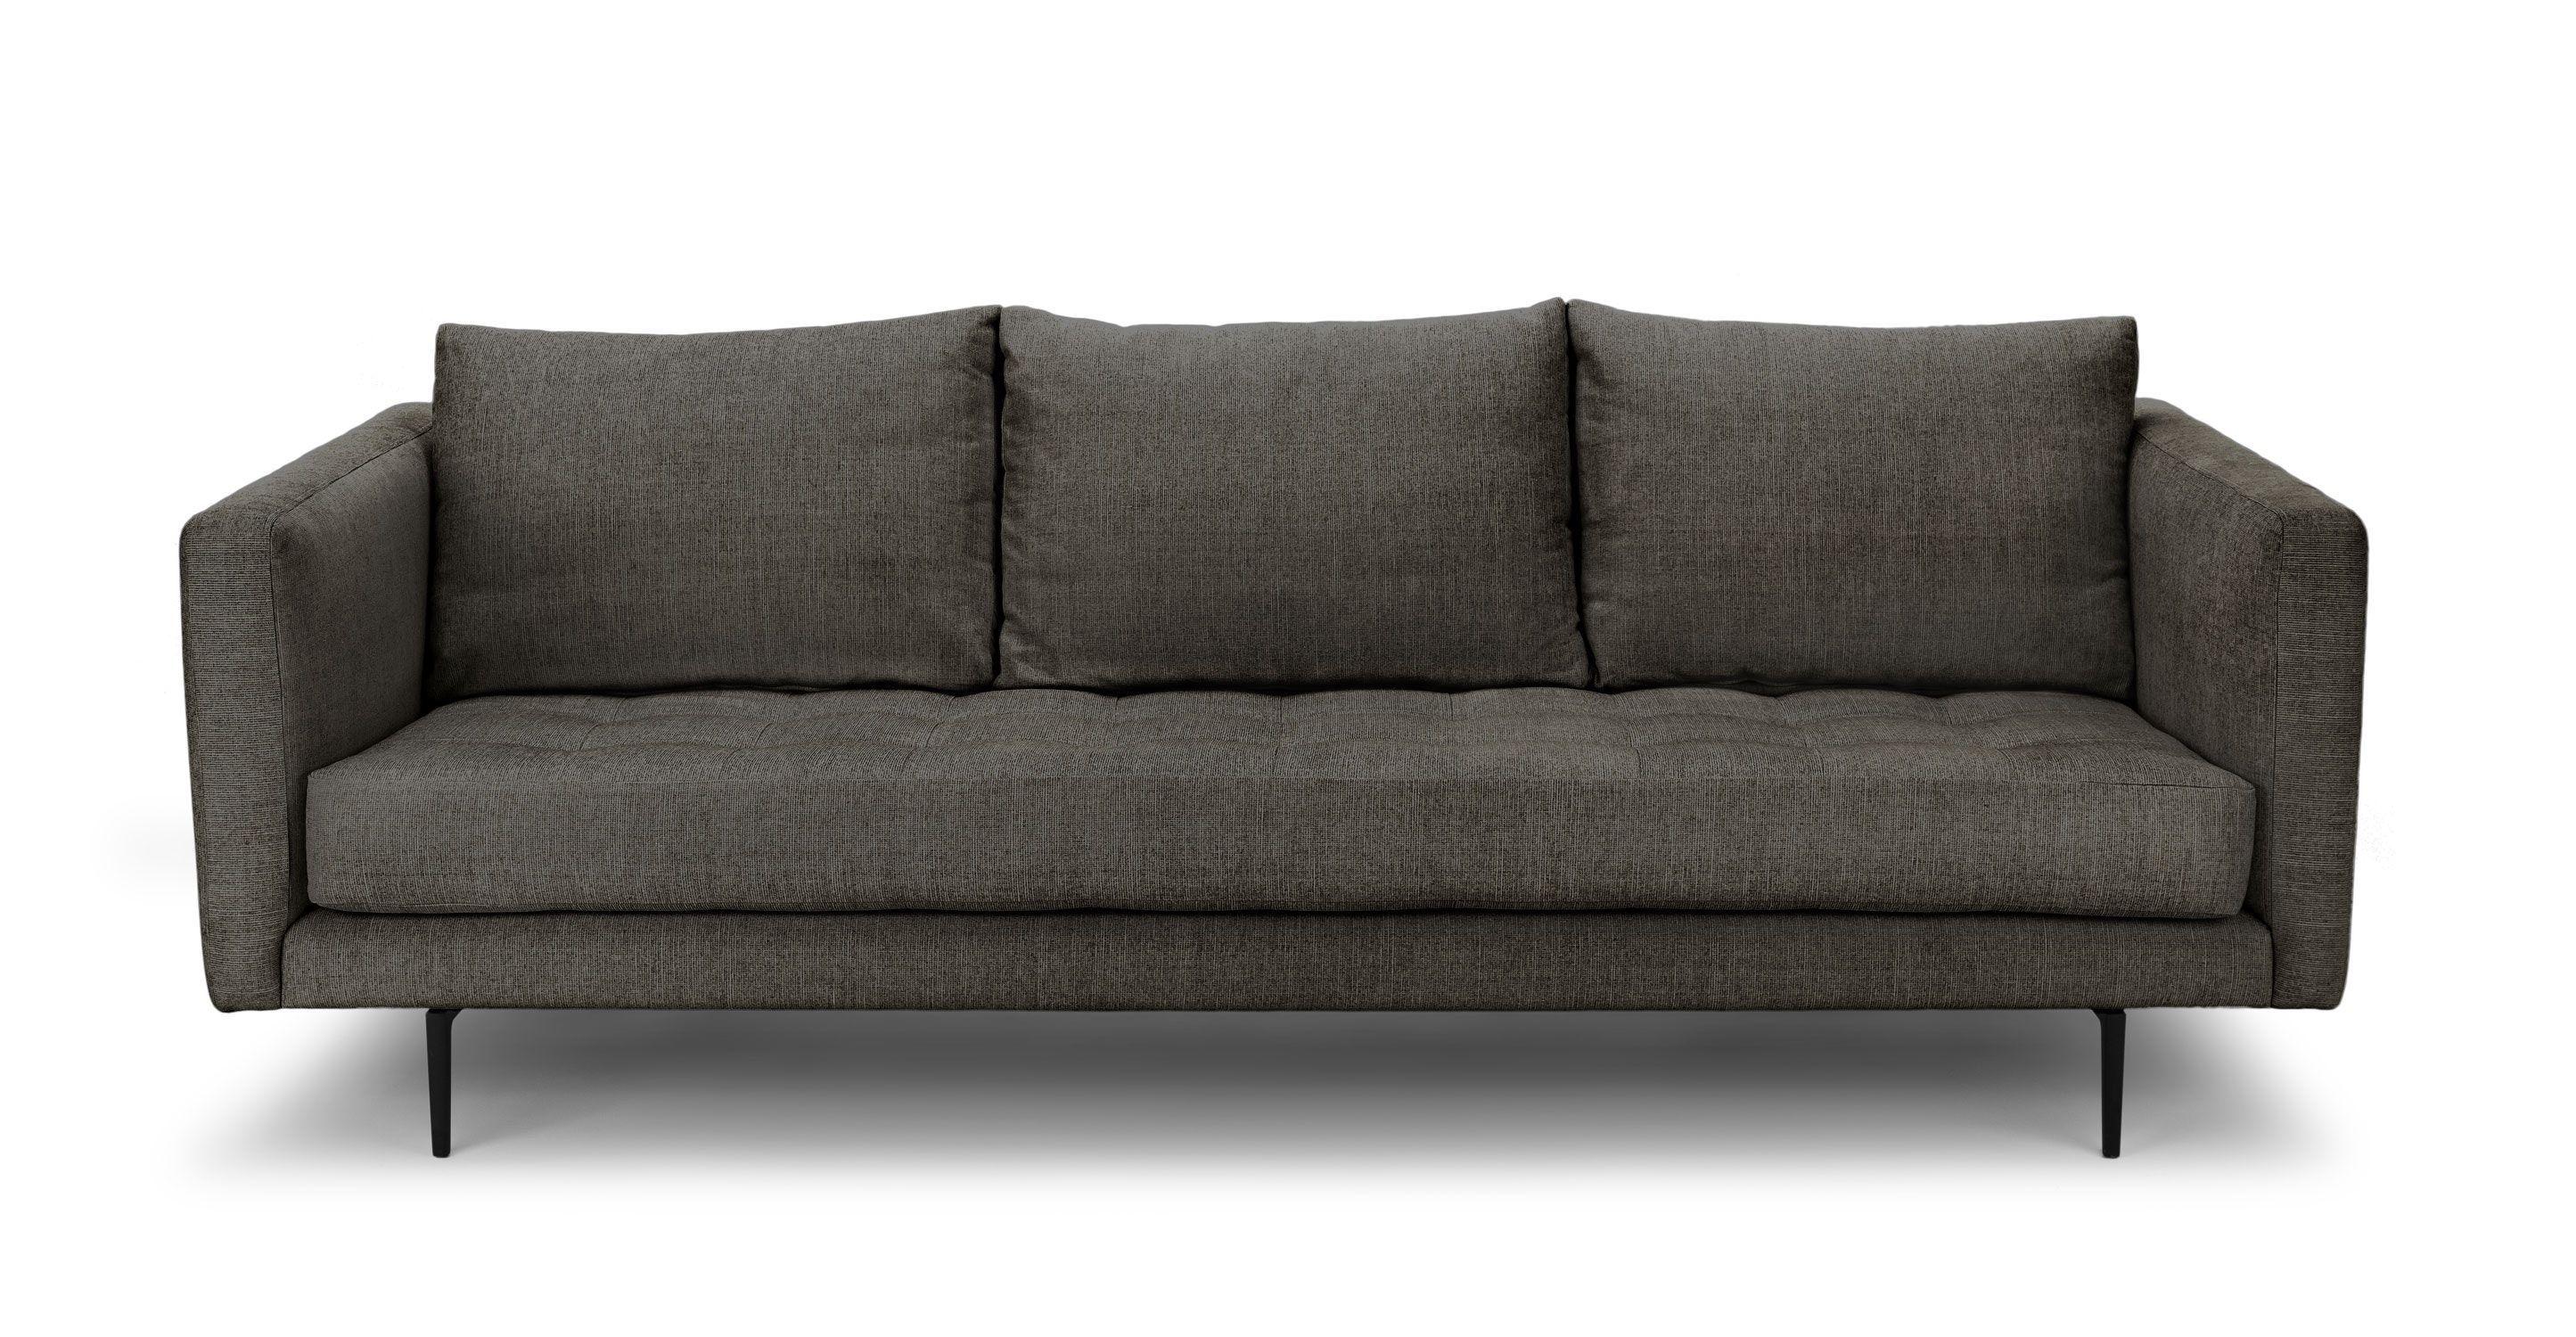 White Tufted Sofa 3 Seater Upholstered